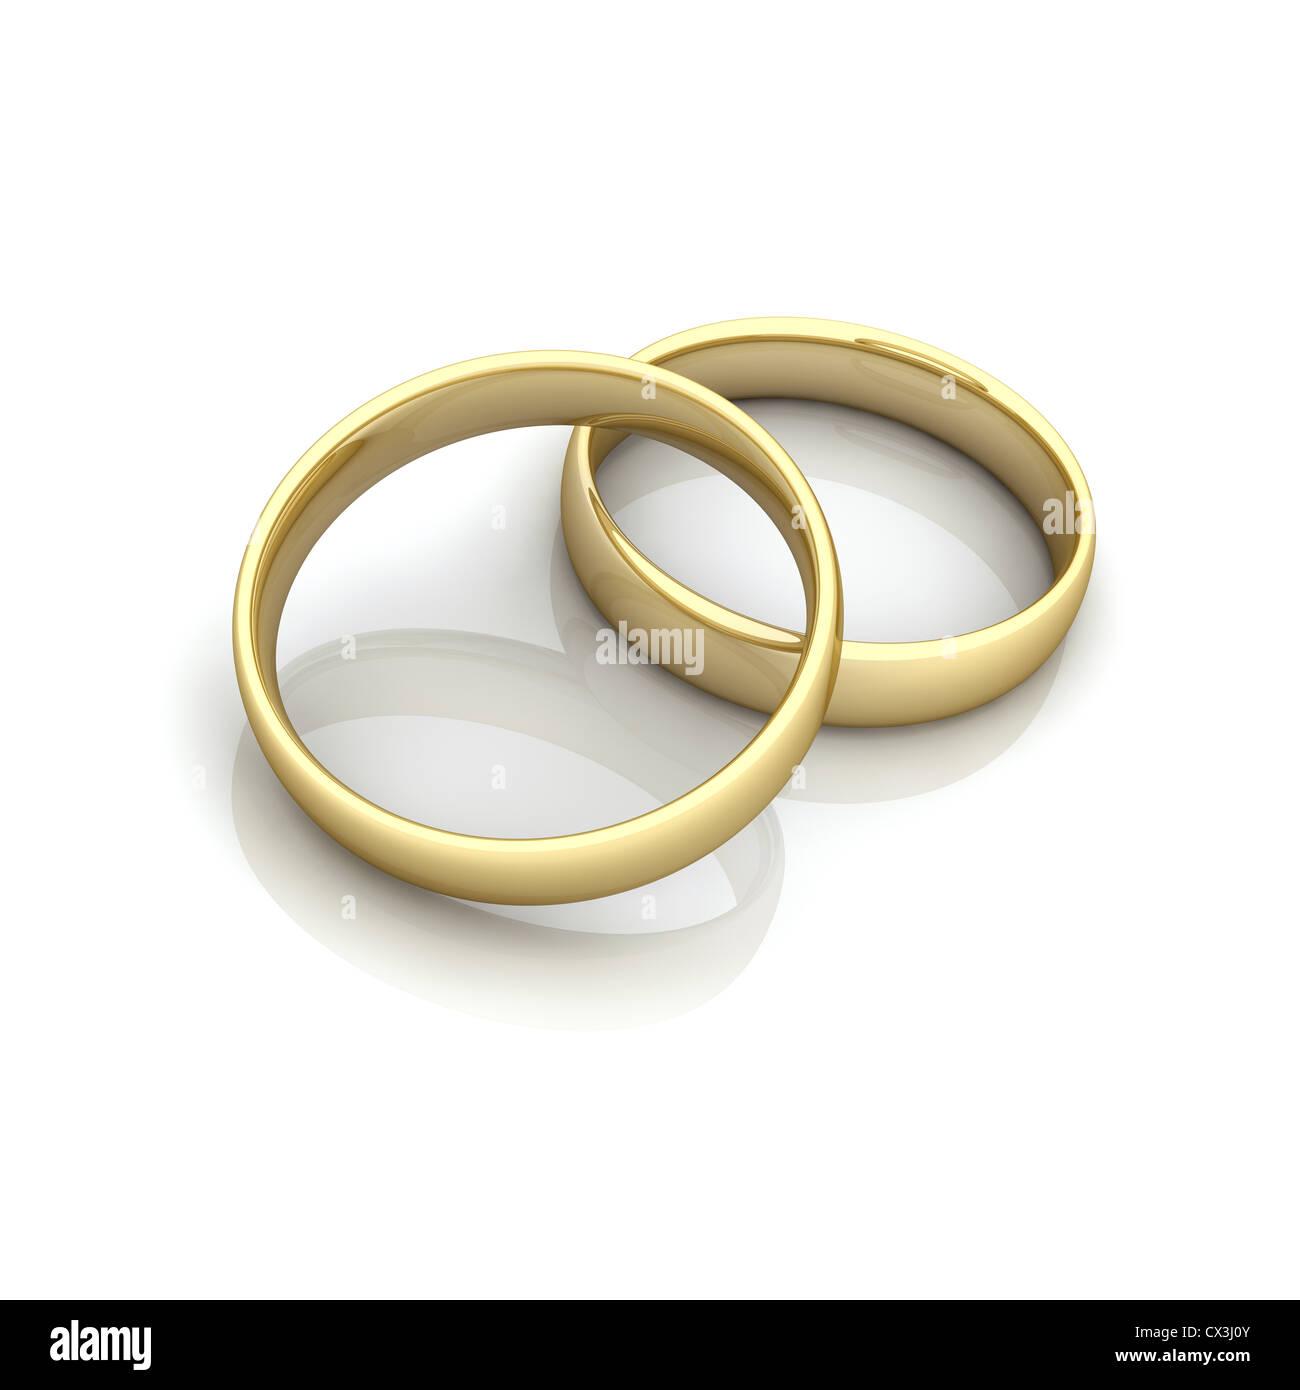 2 beieinander Ringe, símbolo für Fusion / Heirat - 2 anillos, símbolo de matrimonio / fusion Imagen De Stock